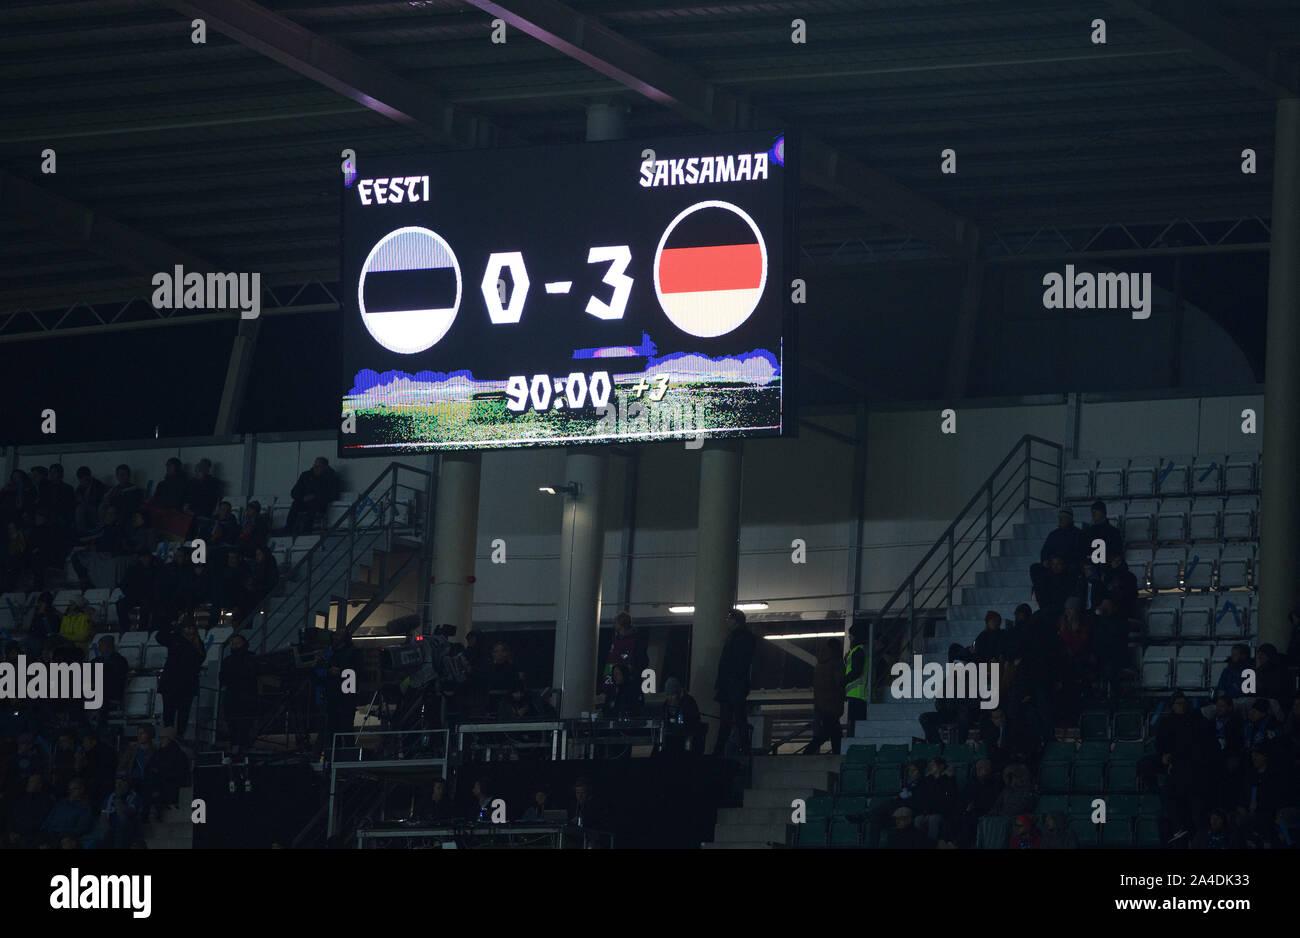 Championship Soccer Scoreboard High Resolution Stock Photography